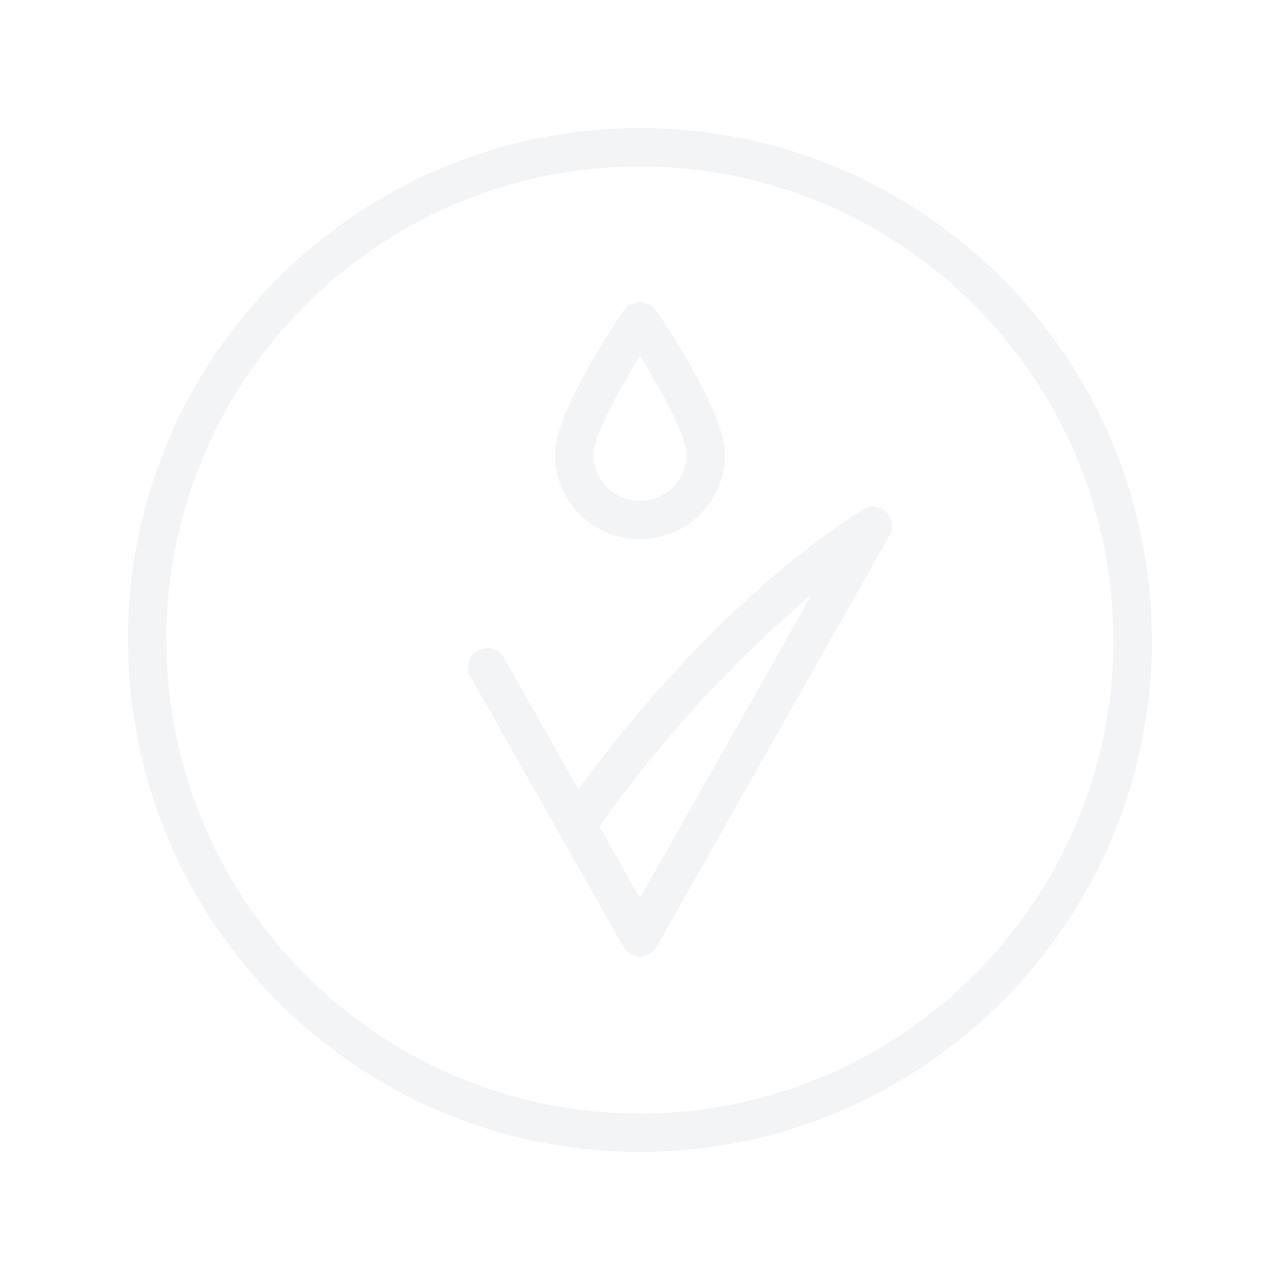 MEXX Whenever Wherever For Him Eau De Toilette